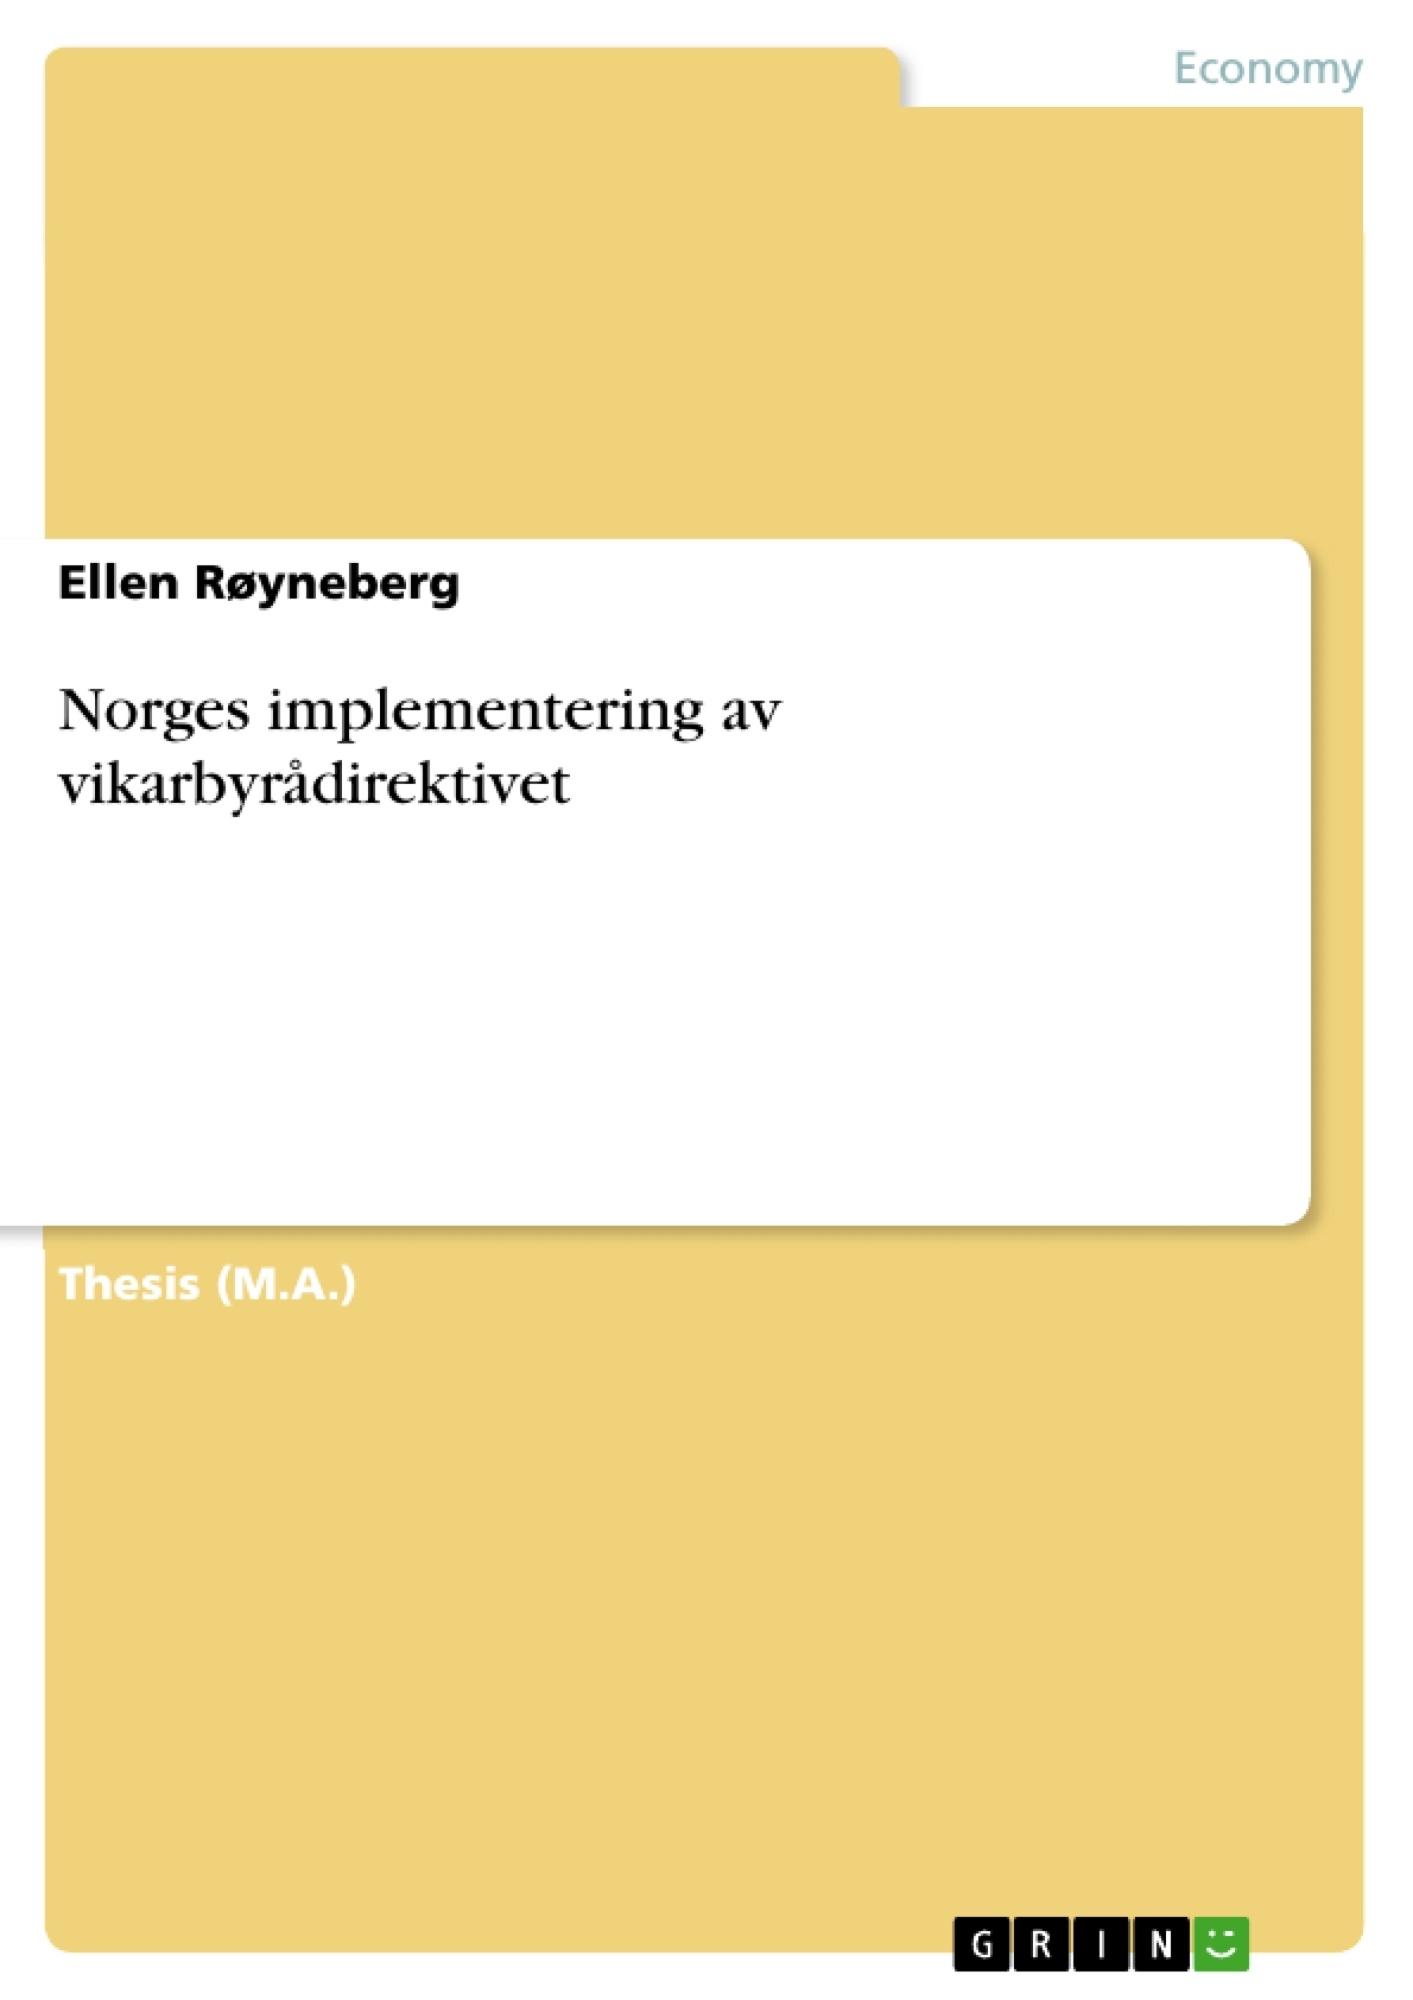 Title: Norges implementering av vikarbyrådirektivet